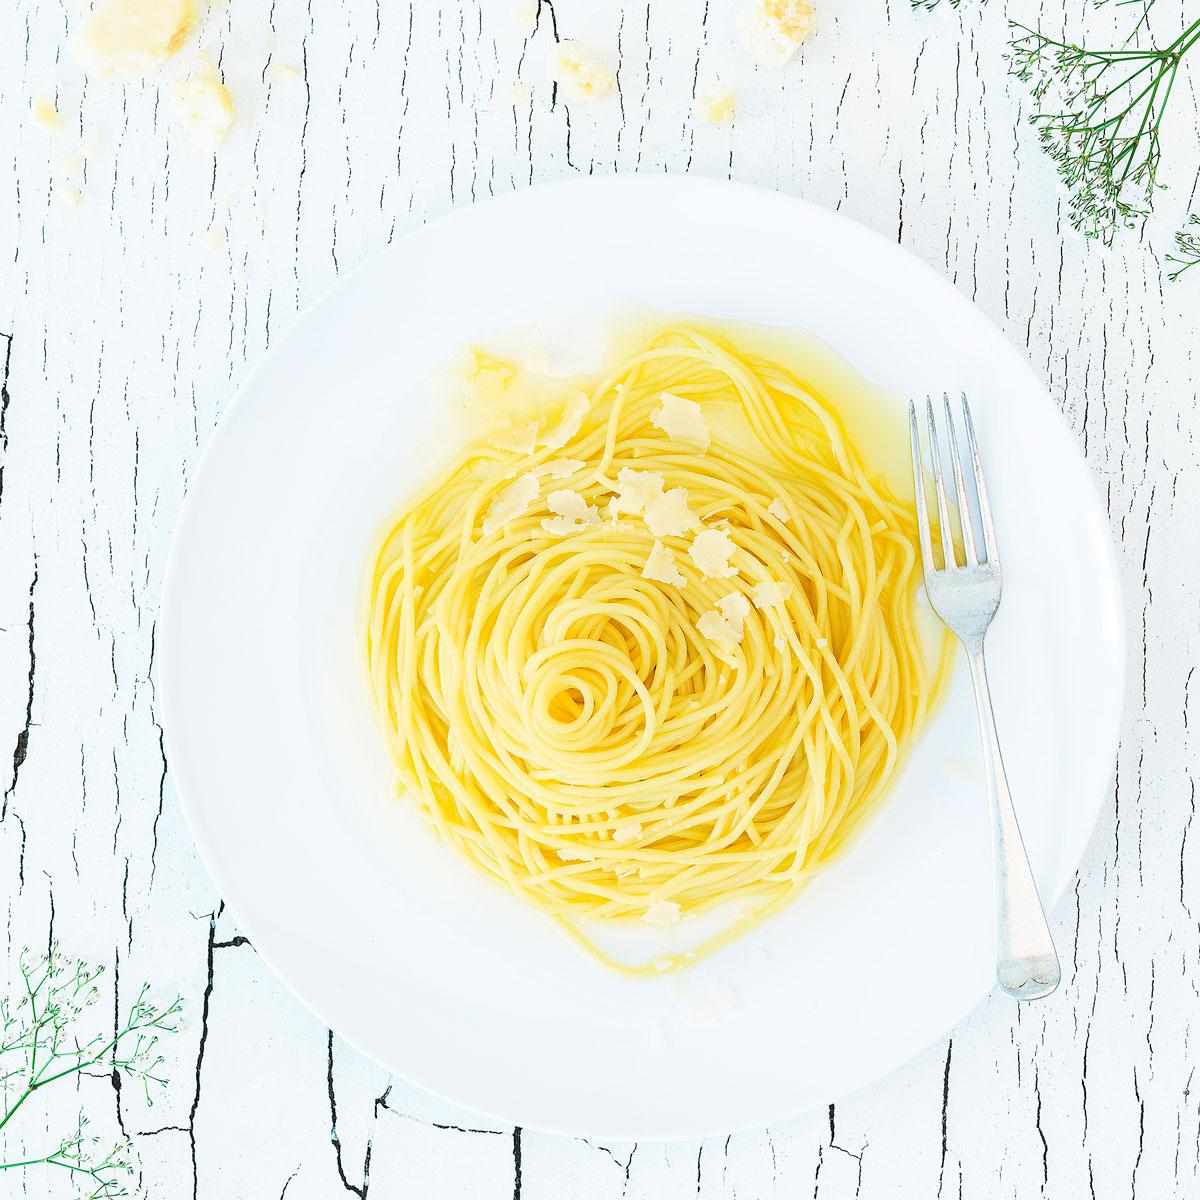 Sylvia-Hartmann-Foodstyling-Food-Styling-Top-Agence-Düsseldorf